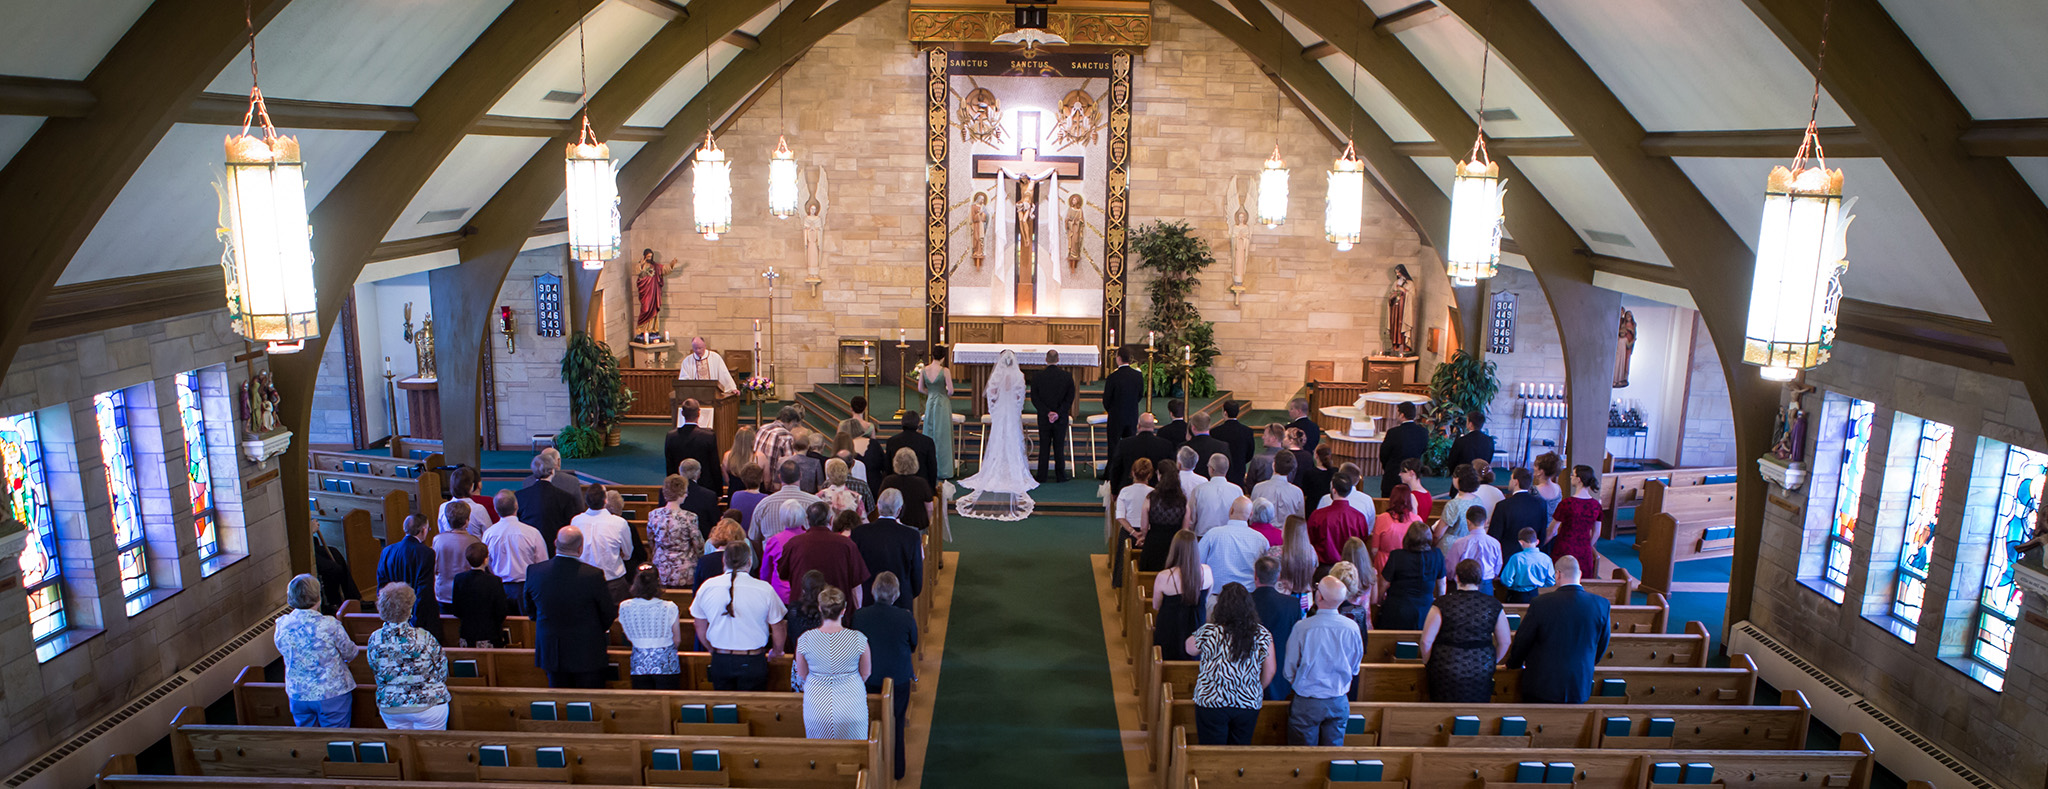 gunn_church_pano_website.jpg